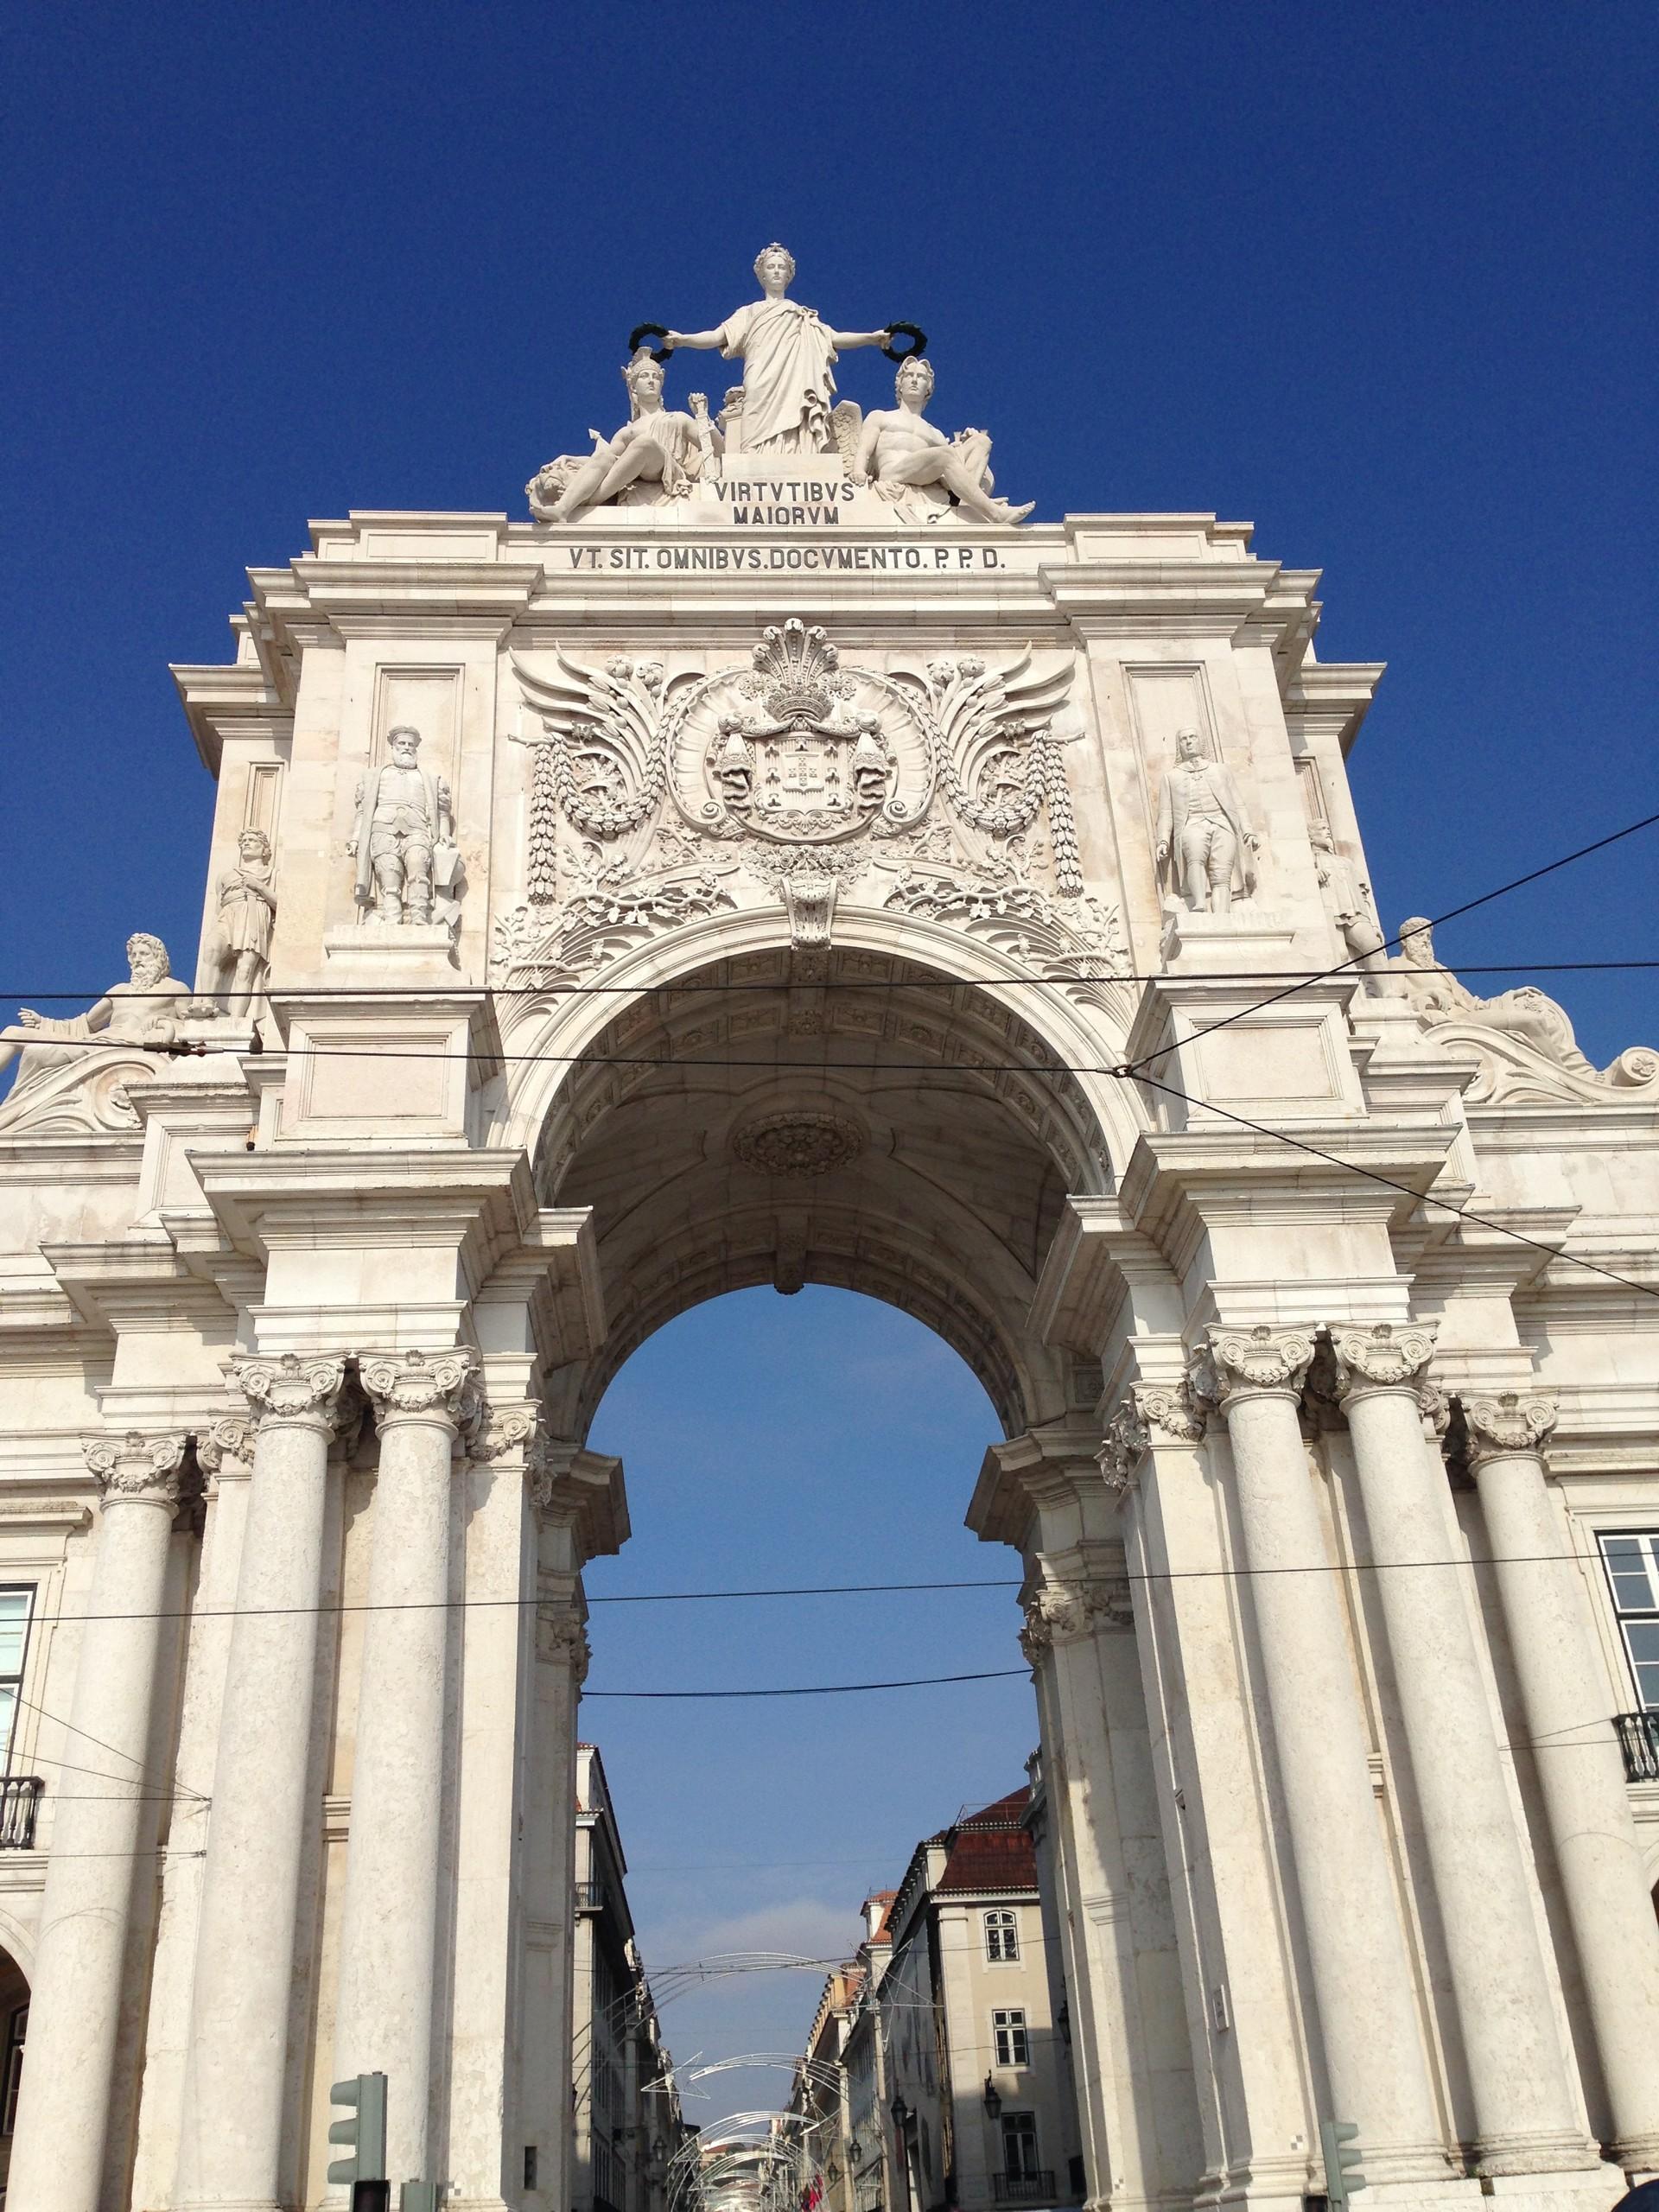 lisbonz-dintorni-piazza-commercio-9a630c